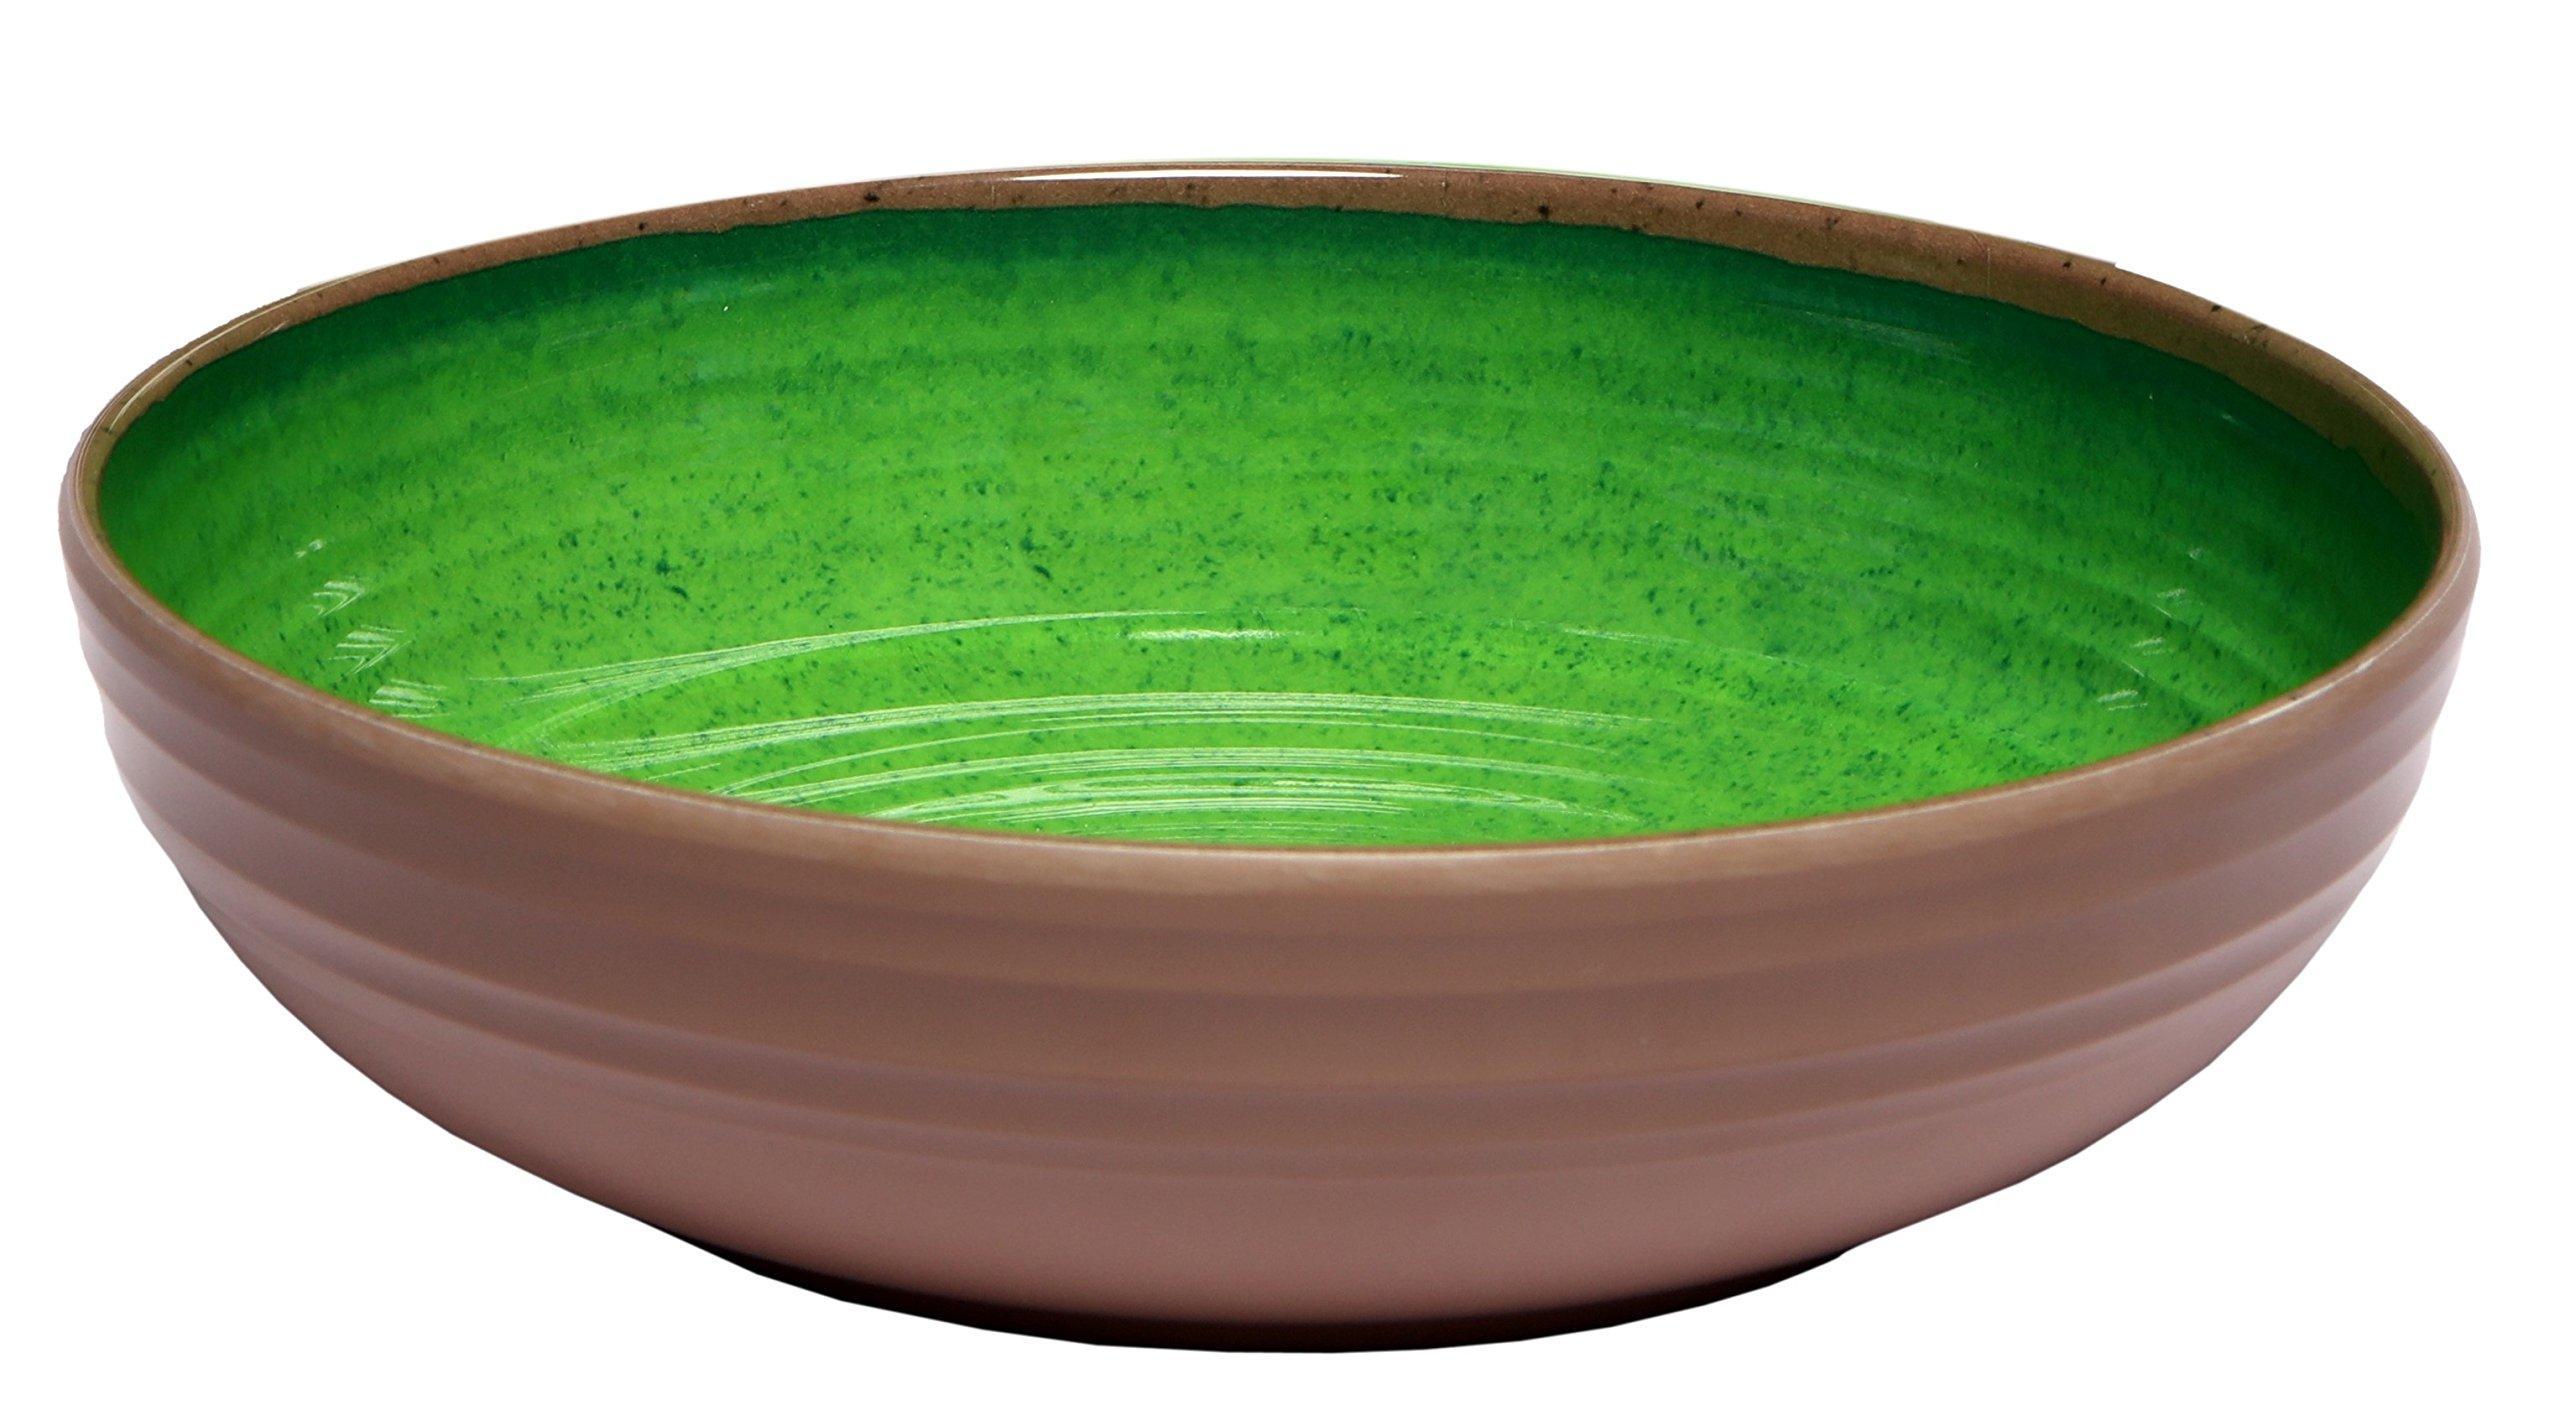 Melange 6-Piece 100% Melamine Pasta Bowl Set (Clay Collection) | Shatter-Proof and Chip-Resistant Melamine Pasta Bowls | Color Green